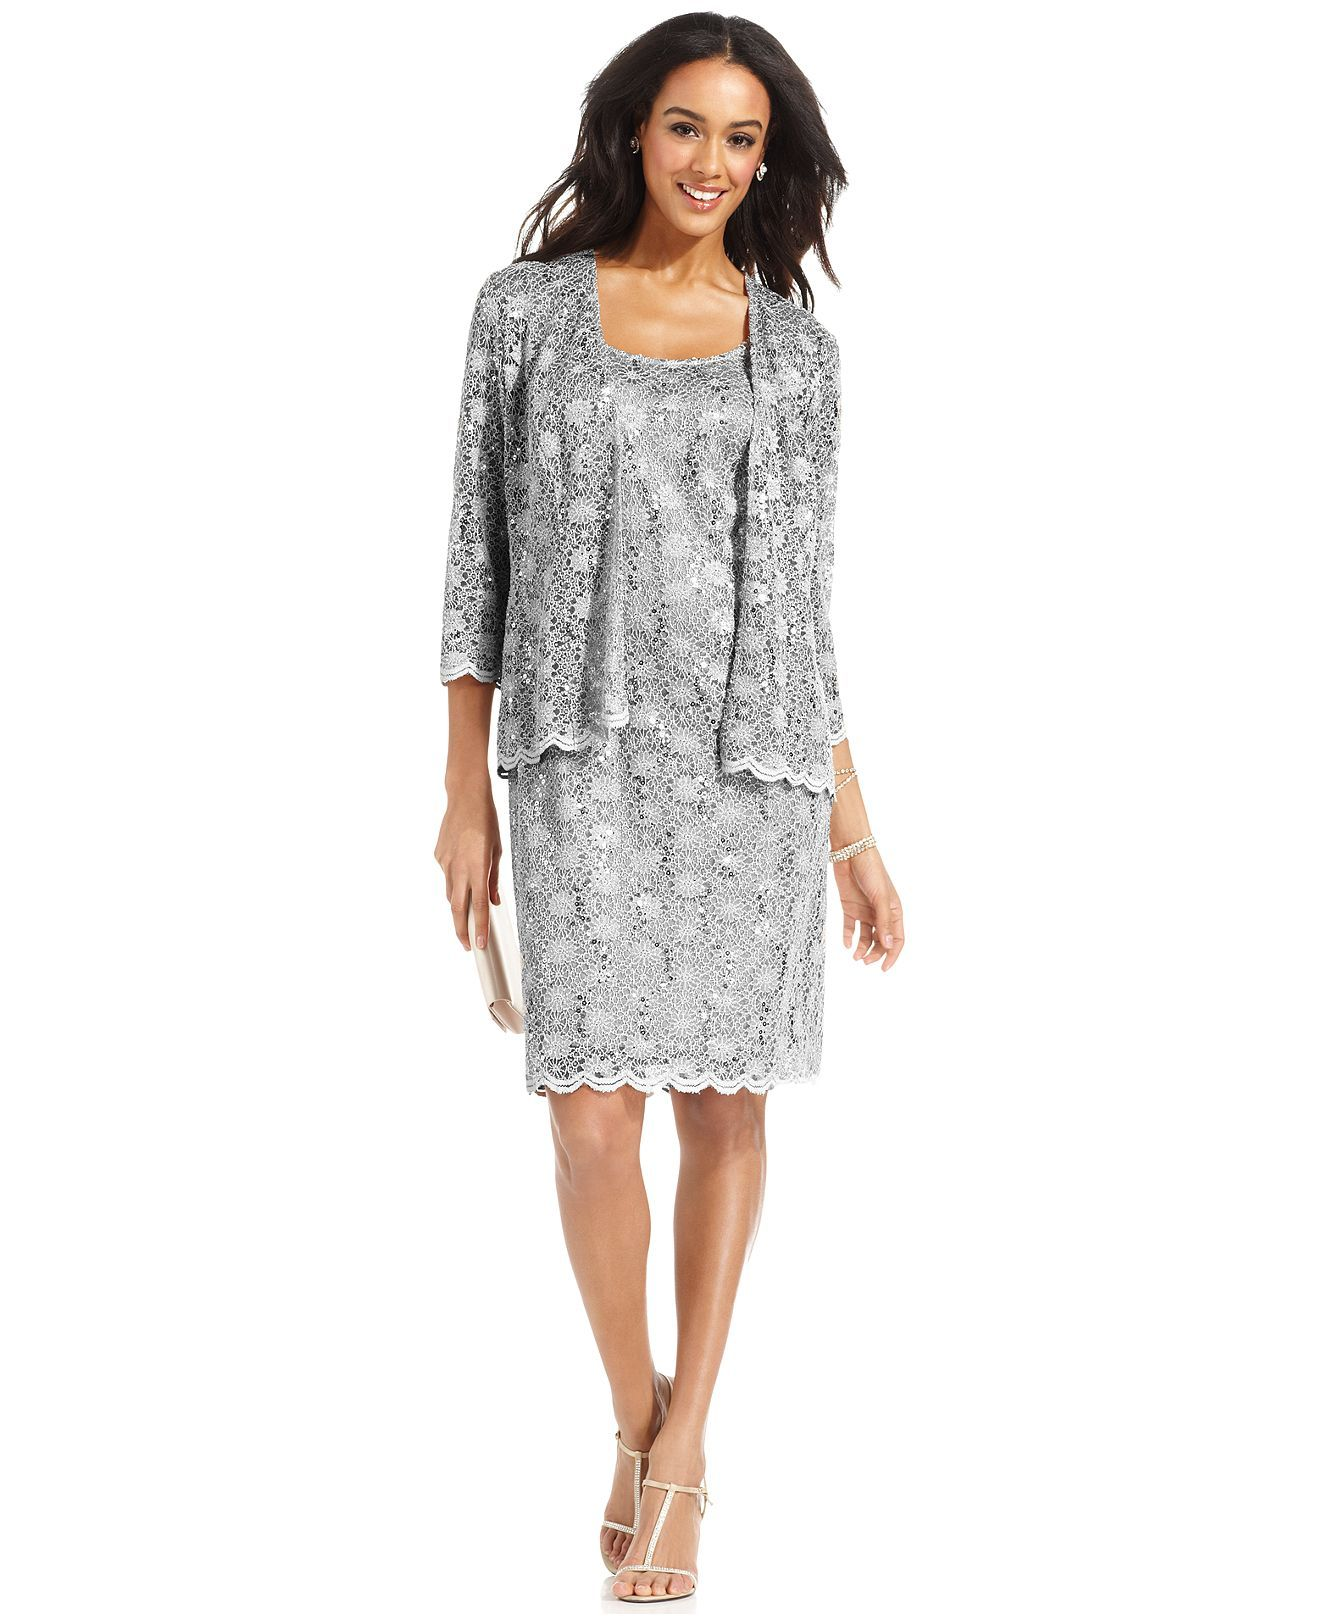 Lace dress macys  R Richards Dress and Jacket Sleeveless Sequined Lace Sheath